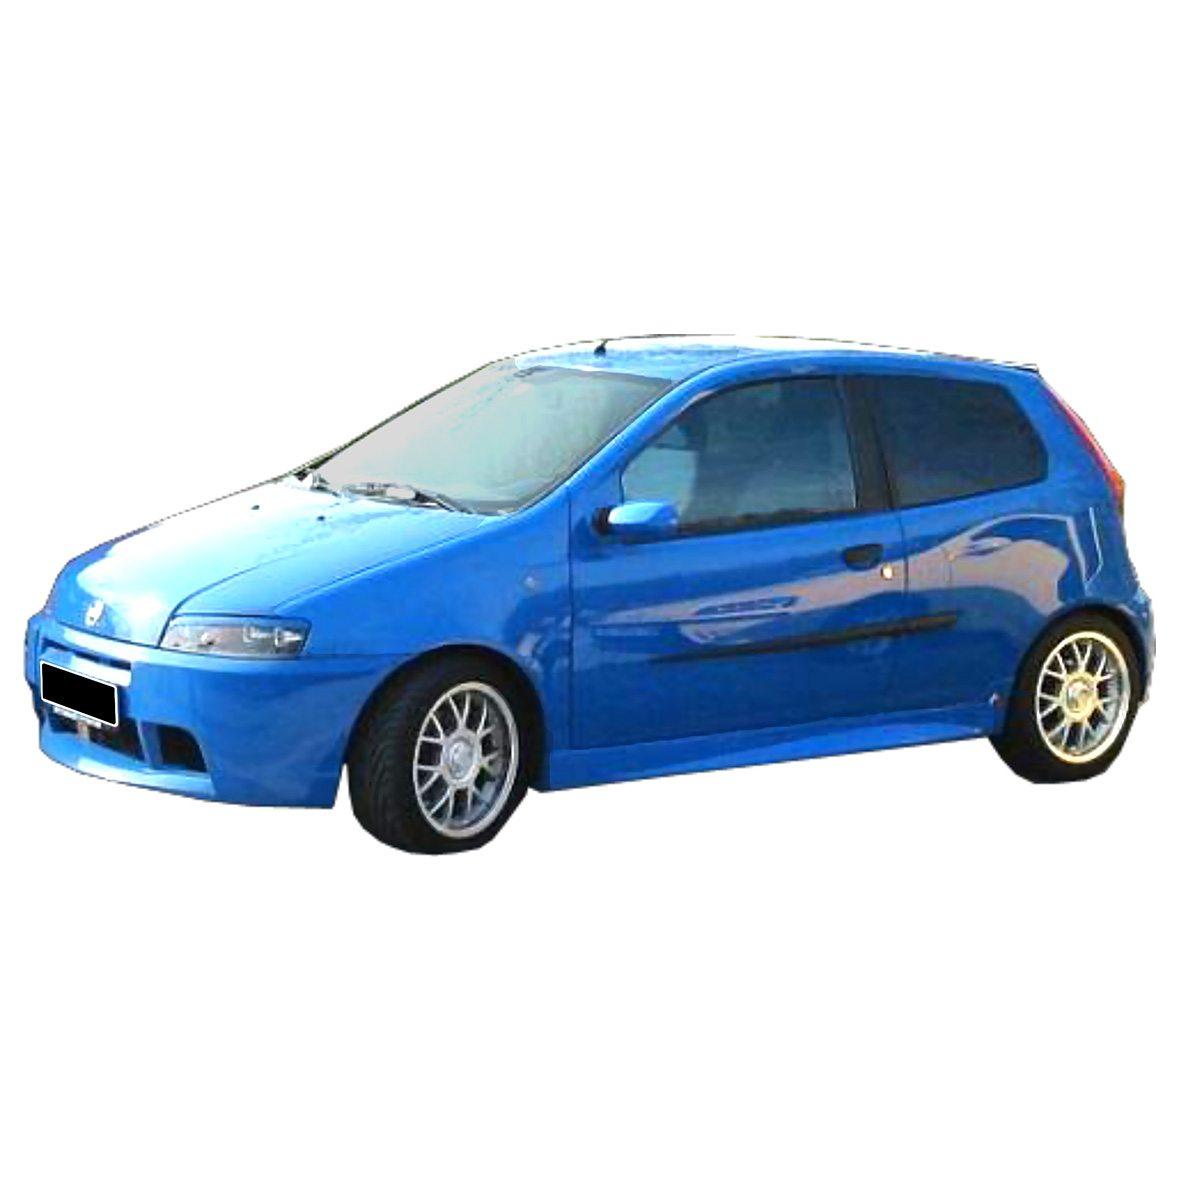 Fiat Punto (99-03) – Embaladeiras Abarth